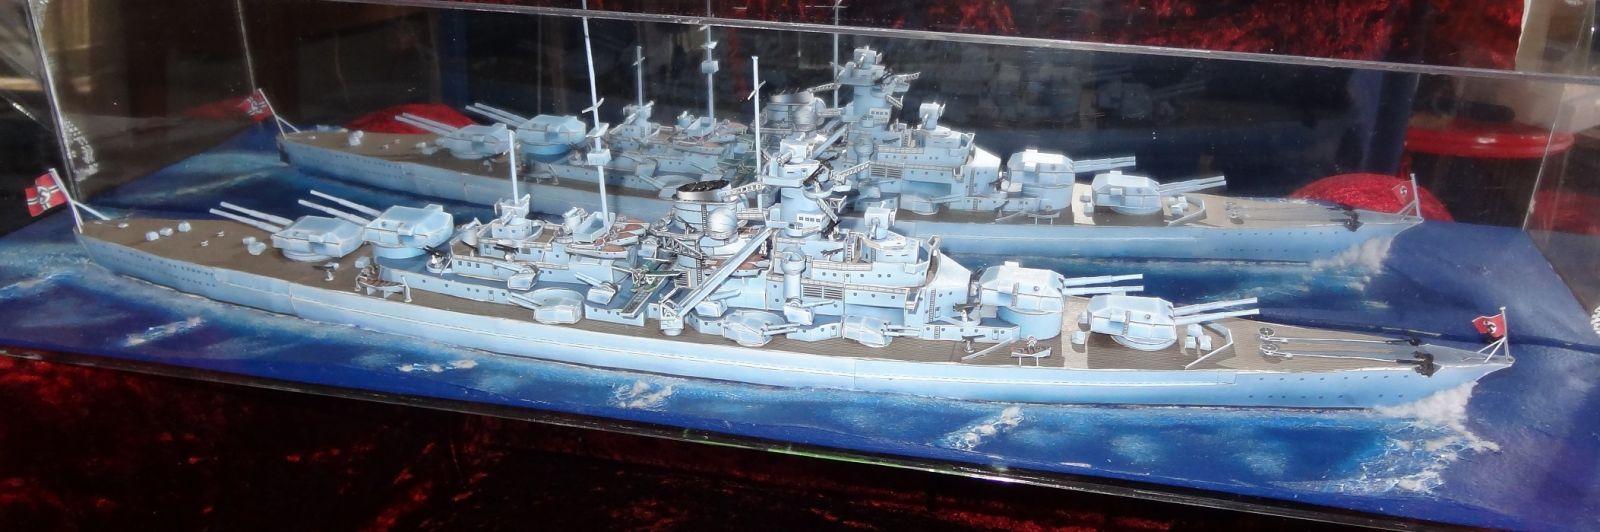 German battleship Bismarck 1:400 all paper - Model Ship